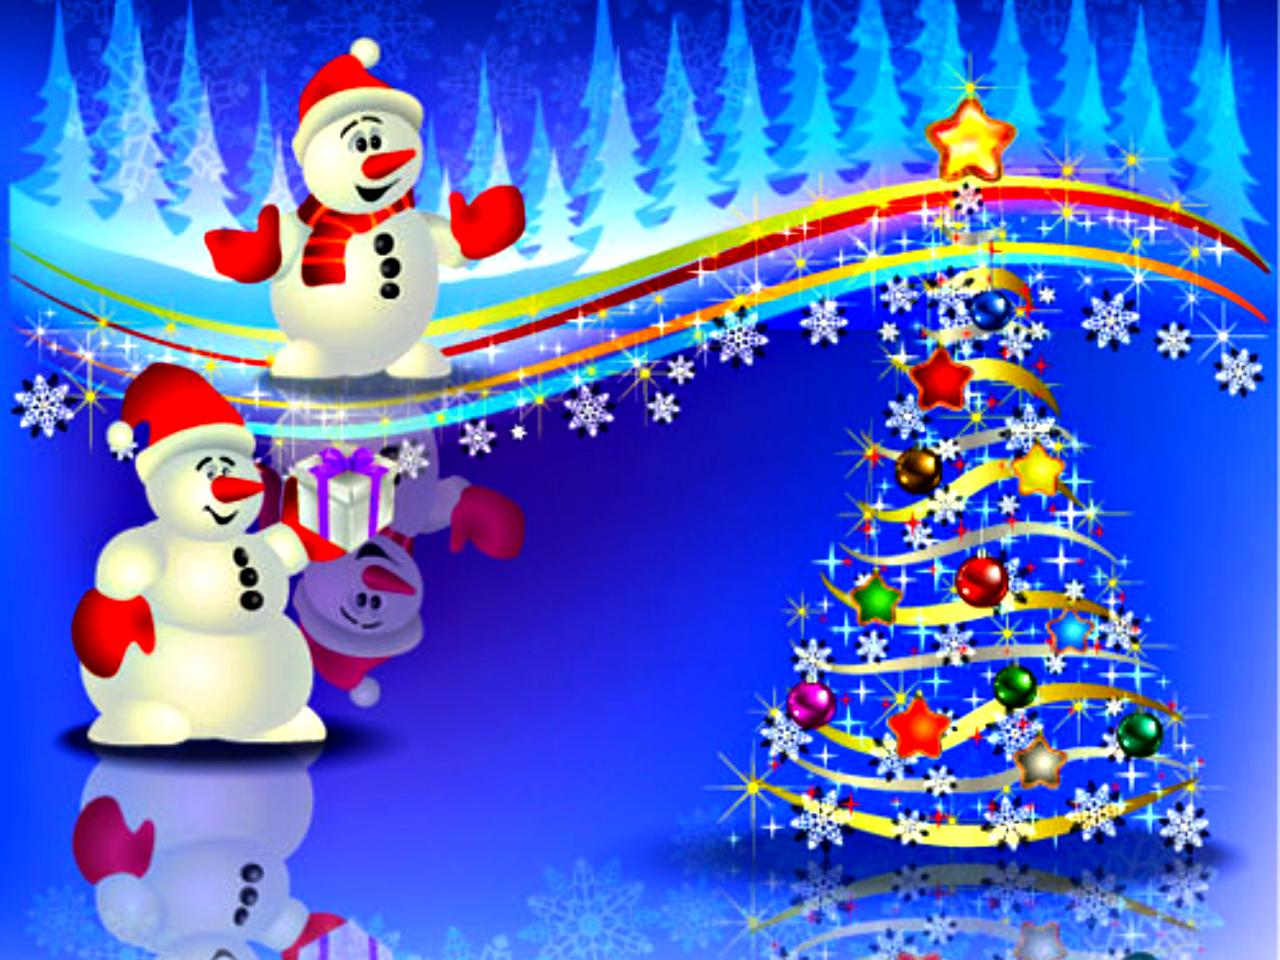 Cartoon Holidays Desktopnexus Wallpaper 34917421 Fanpop